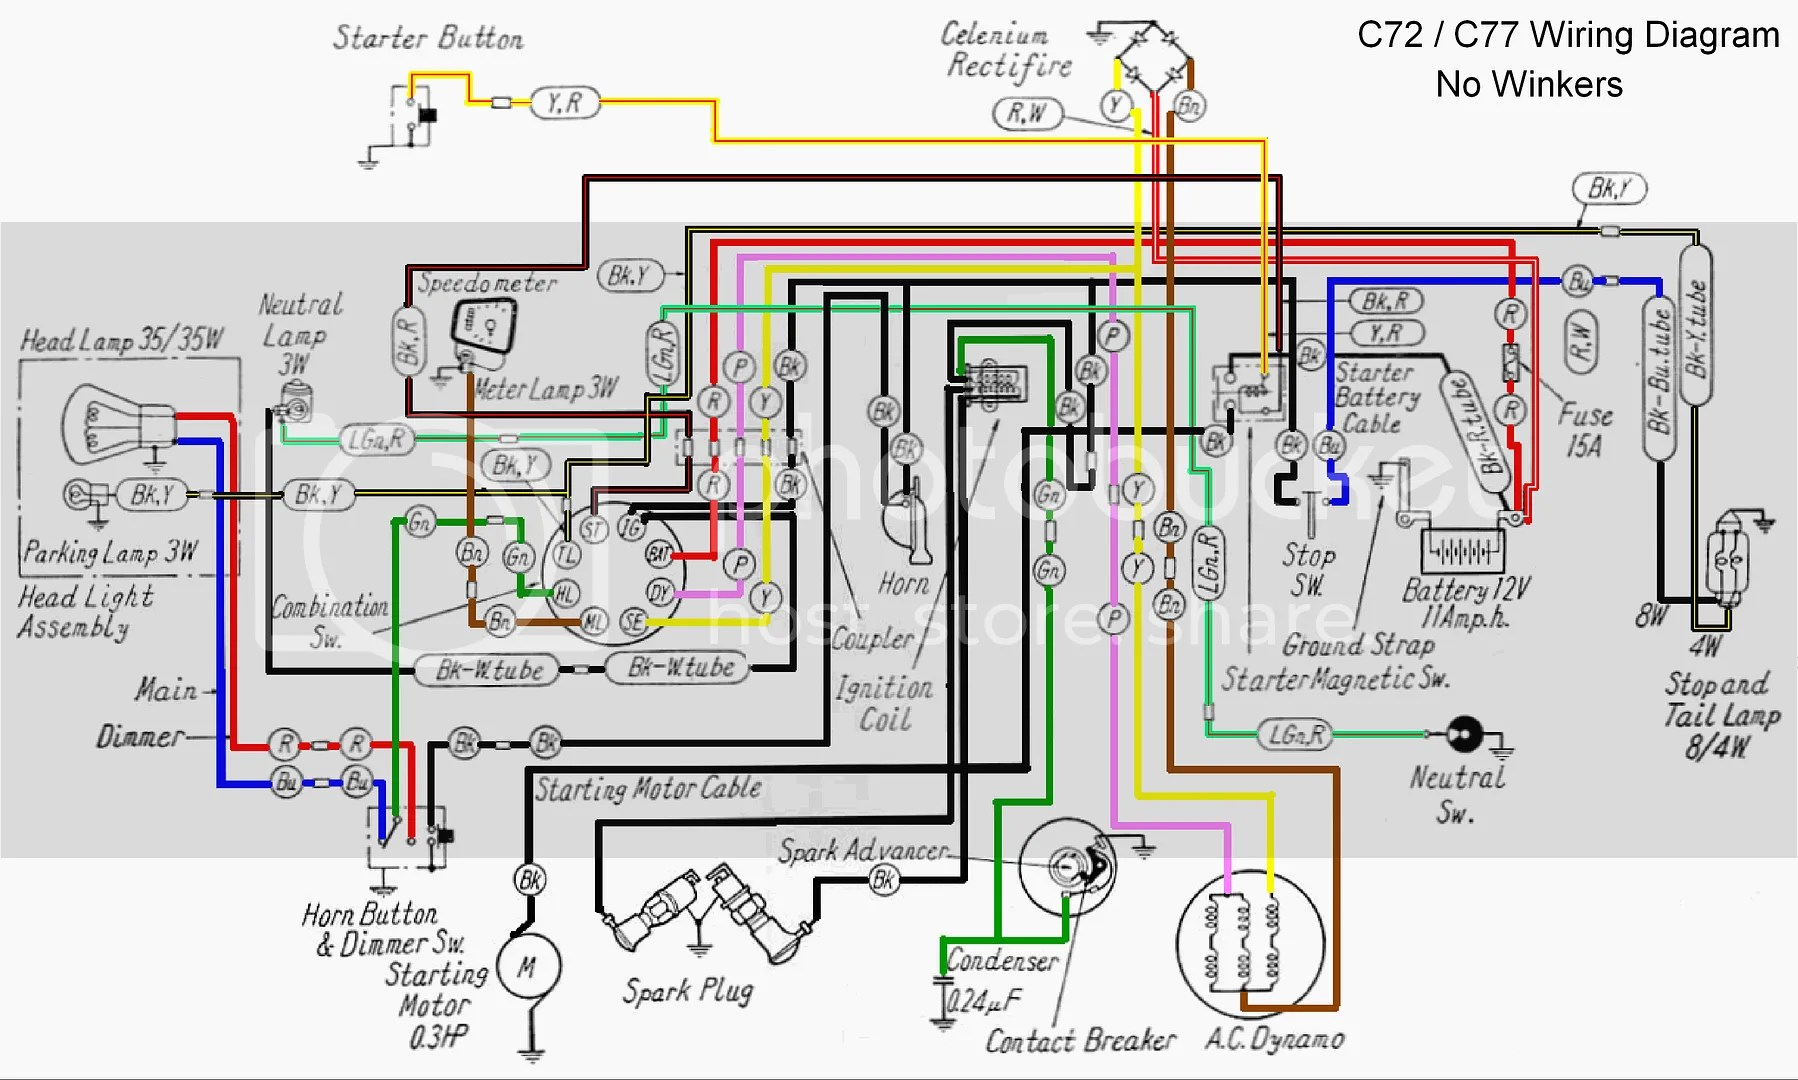 honda dream wiring diagram wiring diagram advance honda bf90 wiring diagram [ 3297 x 1980 Pixel ]